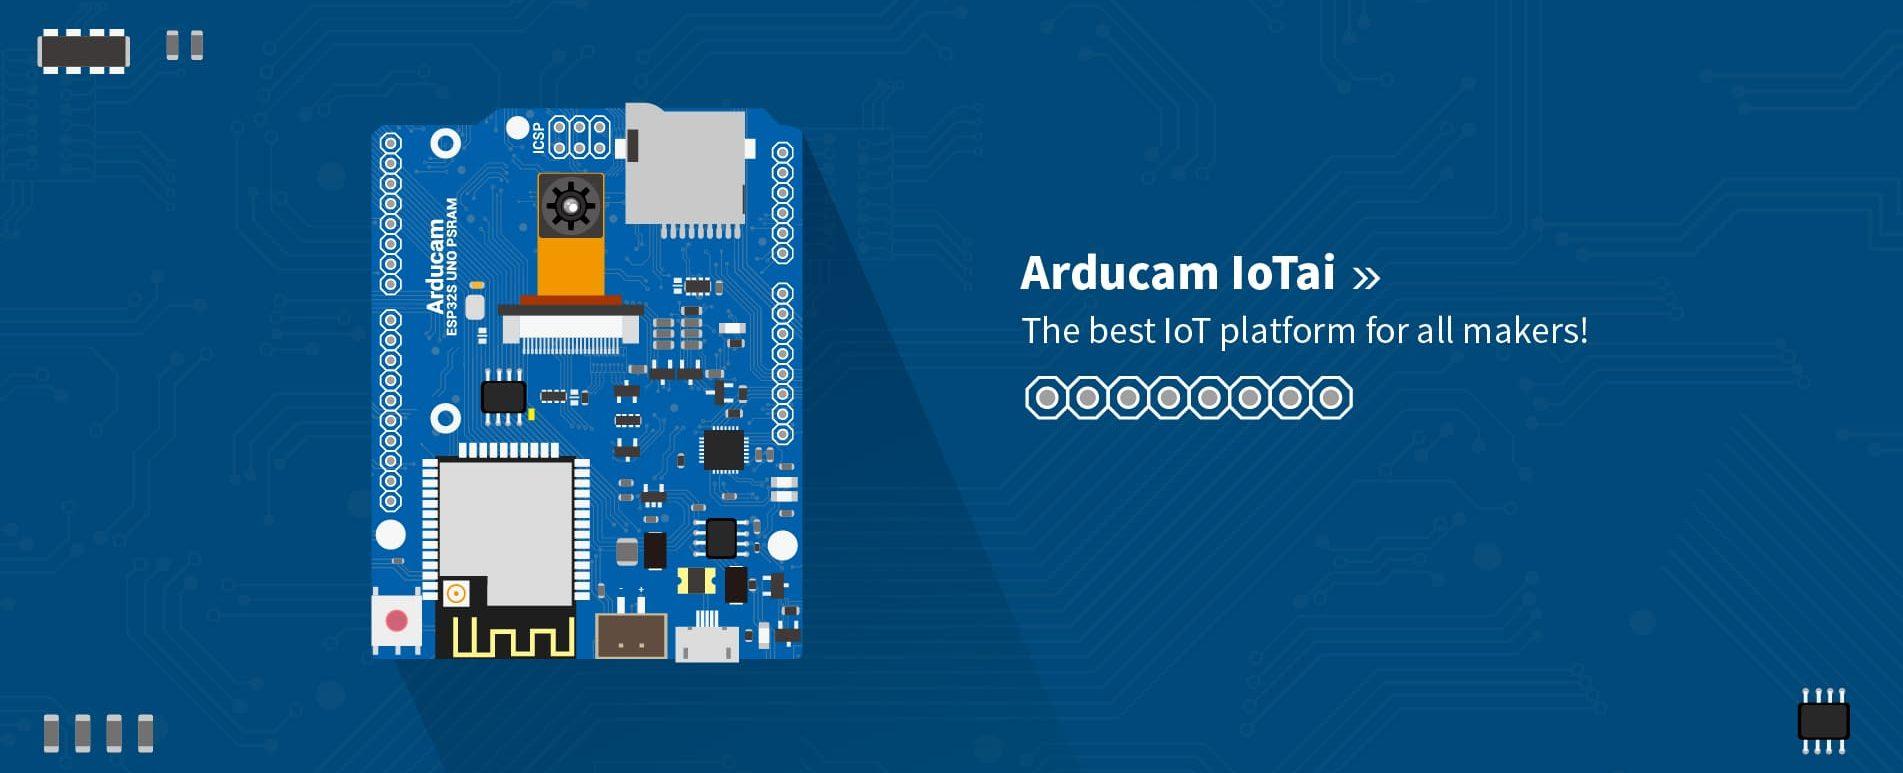 arducam-esp-32-iotai-development-board-banner